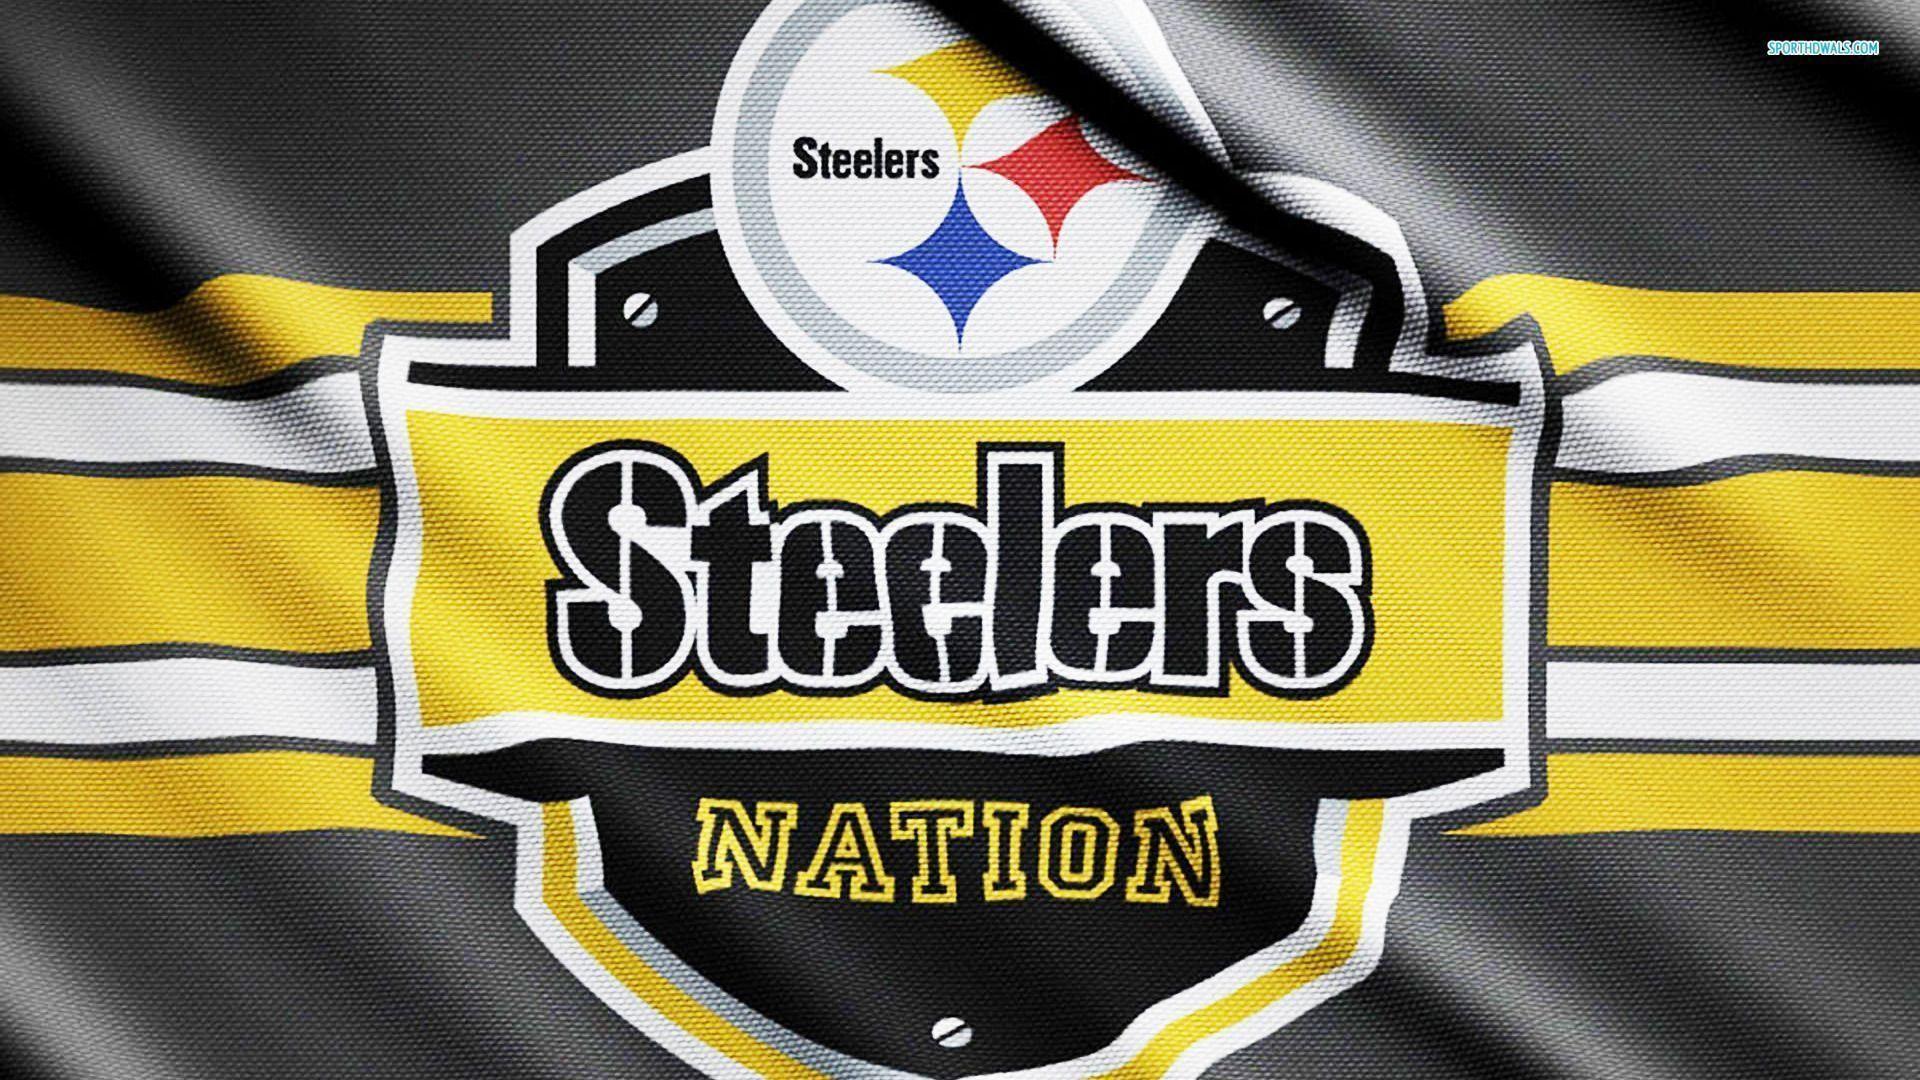 Pittsburgh Steelers wallpaper HD – Brand & Logo Wallpapers .